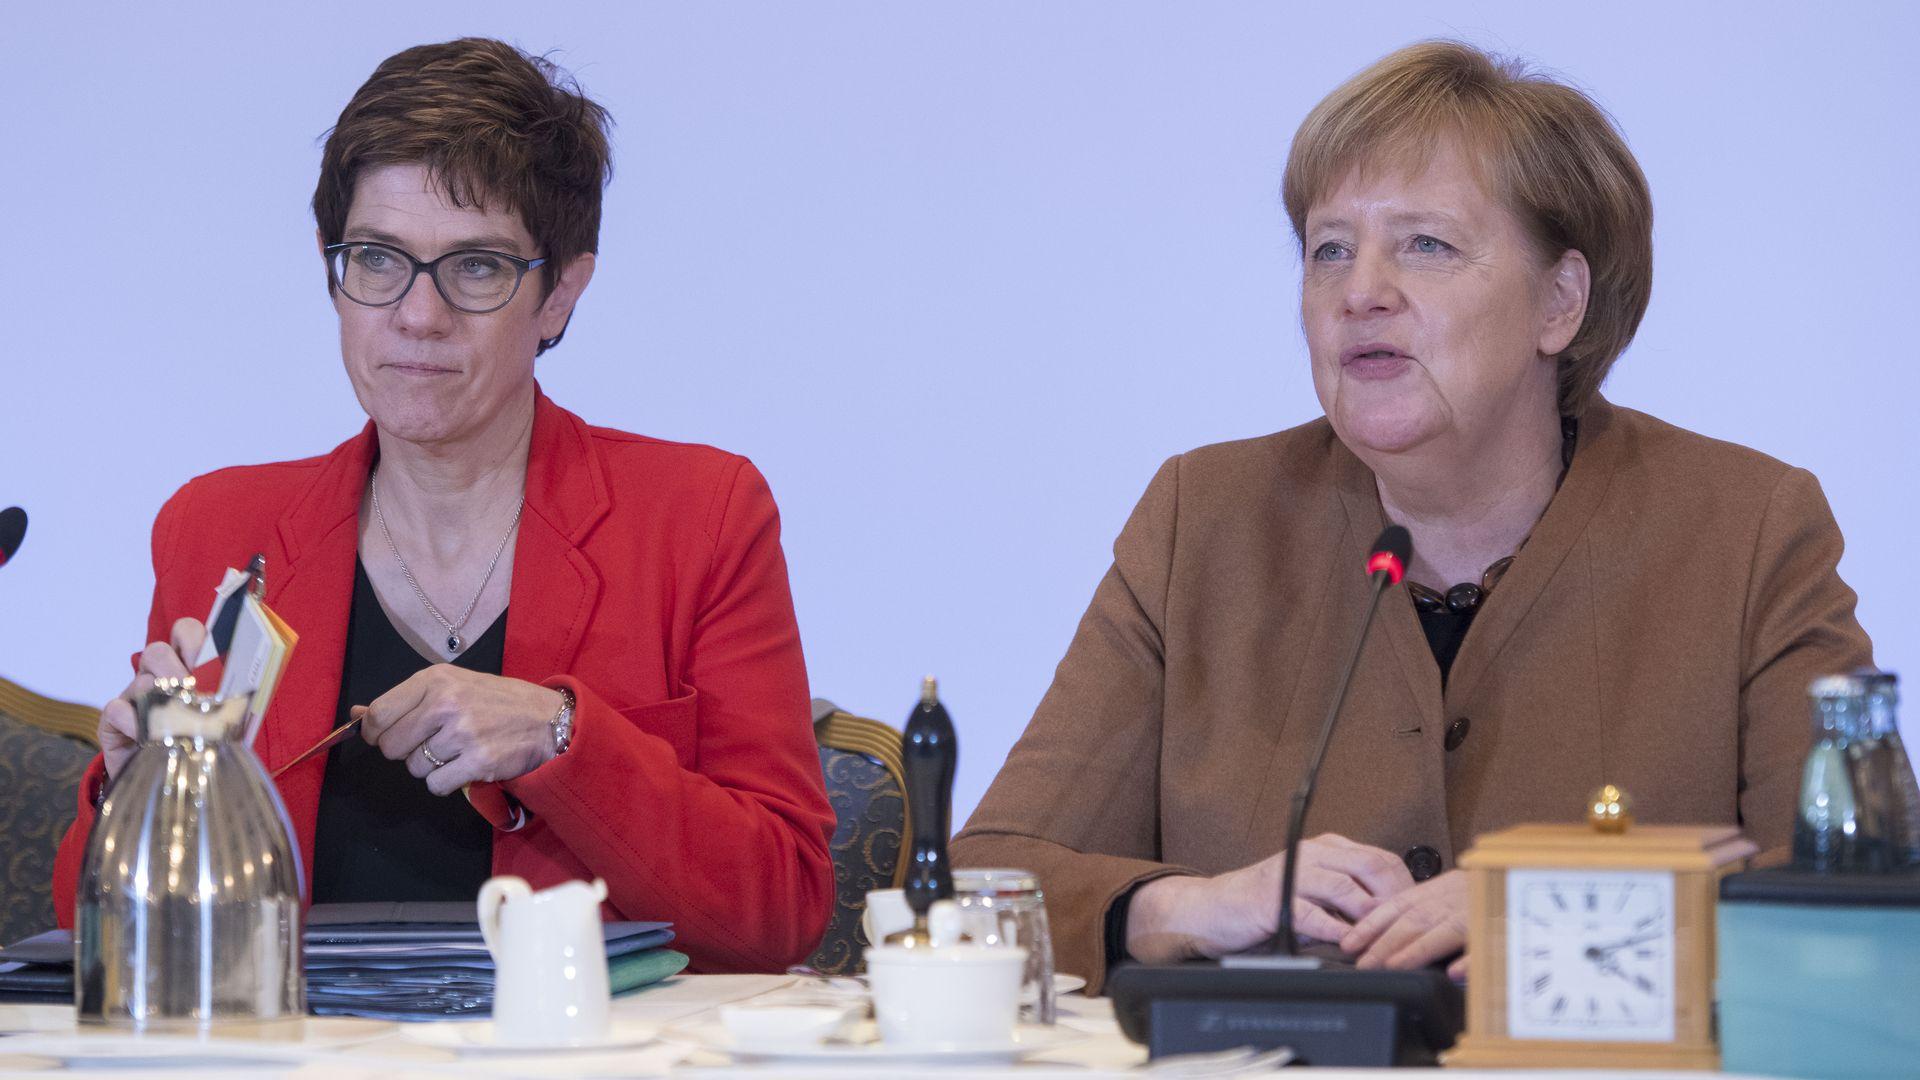 Angela Merkel and AKK seated at a CDU party event